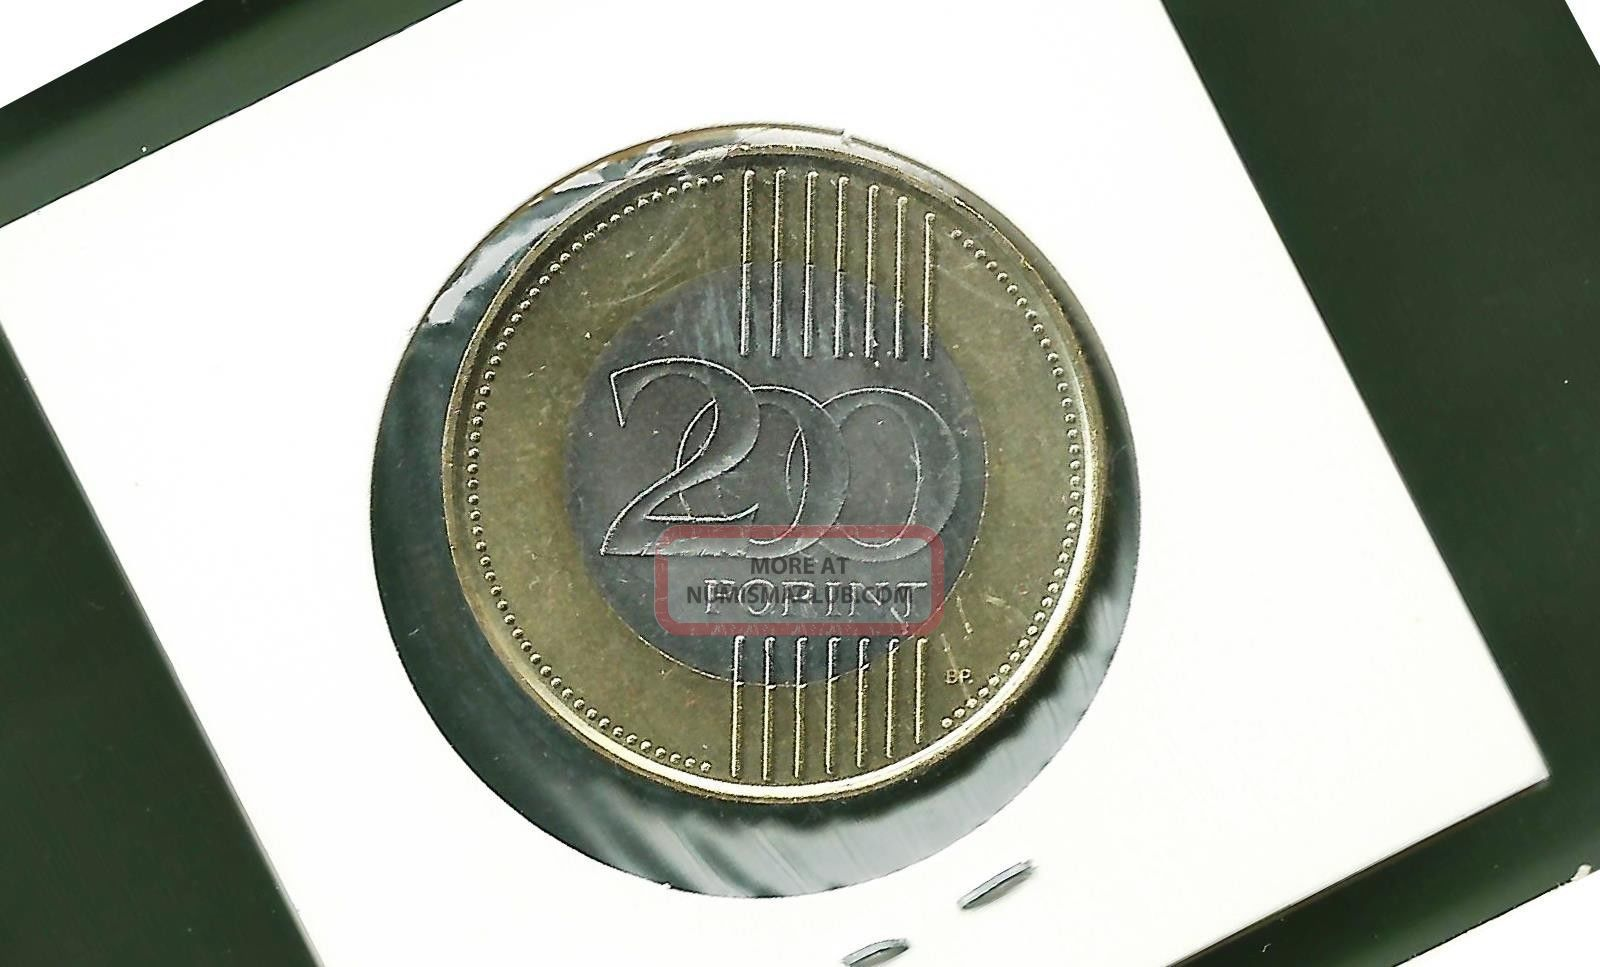 Hungary 2009 200 Forint Bi - Metallic Unc Coin Europe photo